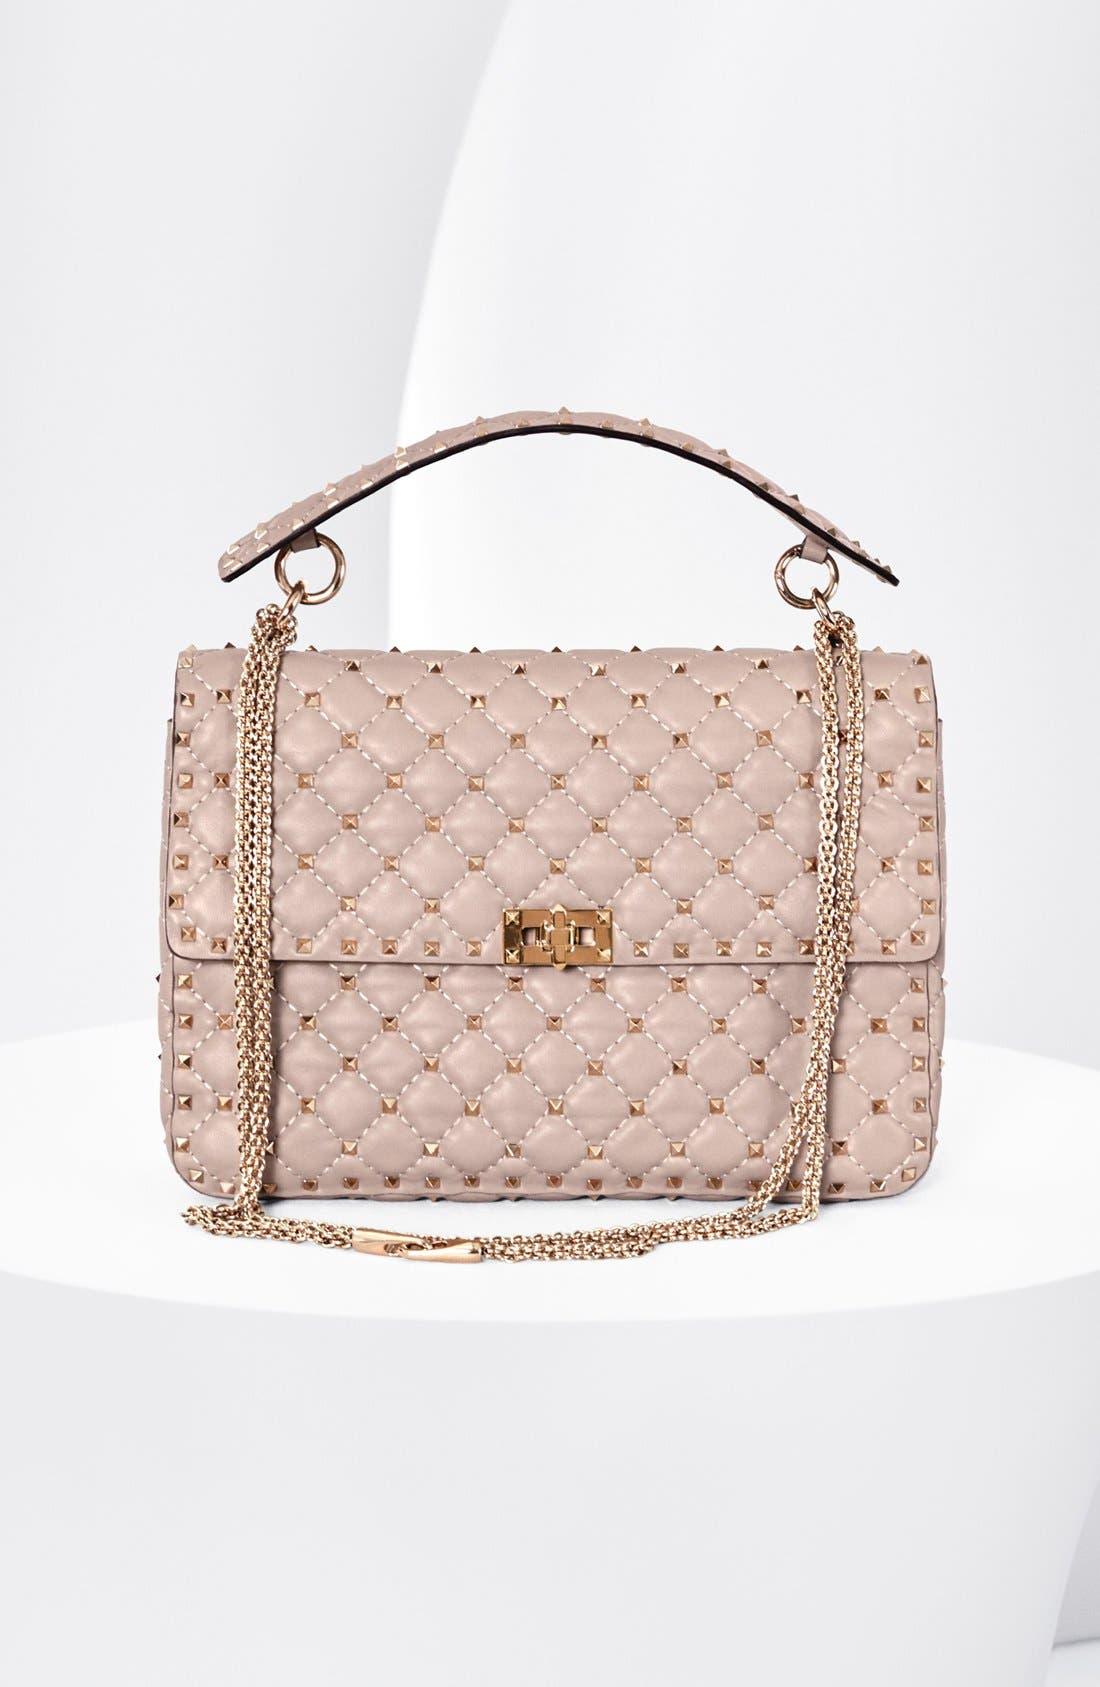 Valentino 'Rockstud Matelassé' Shoulder Bag